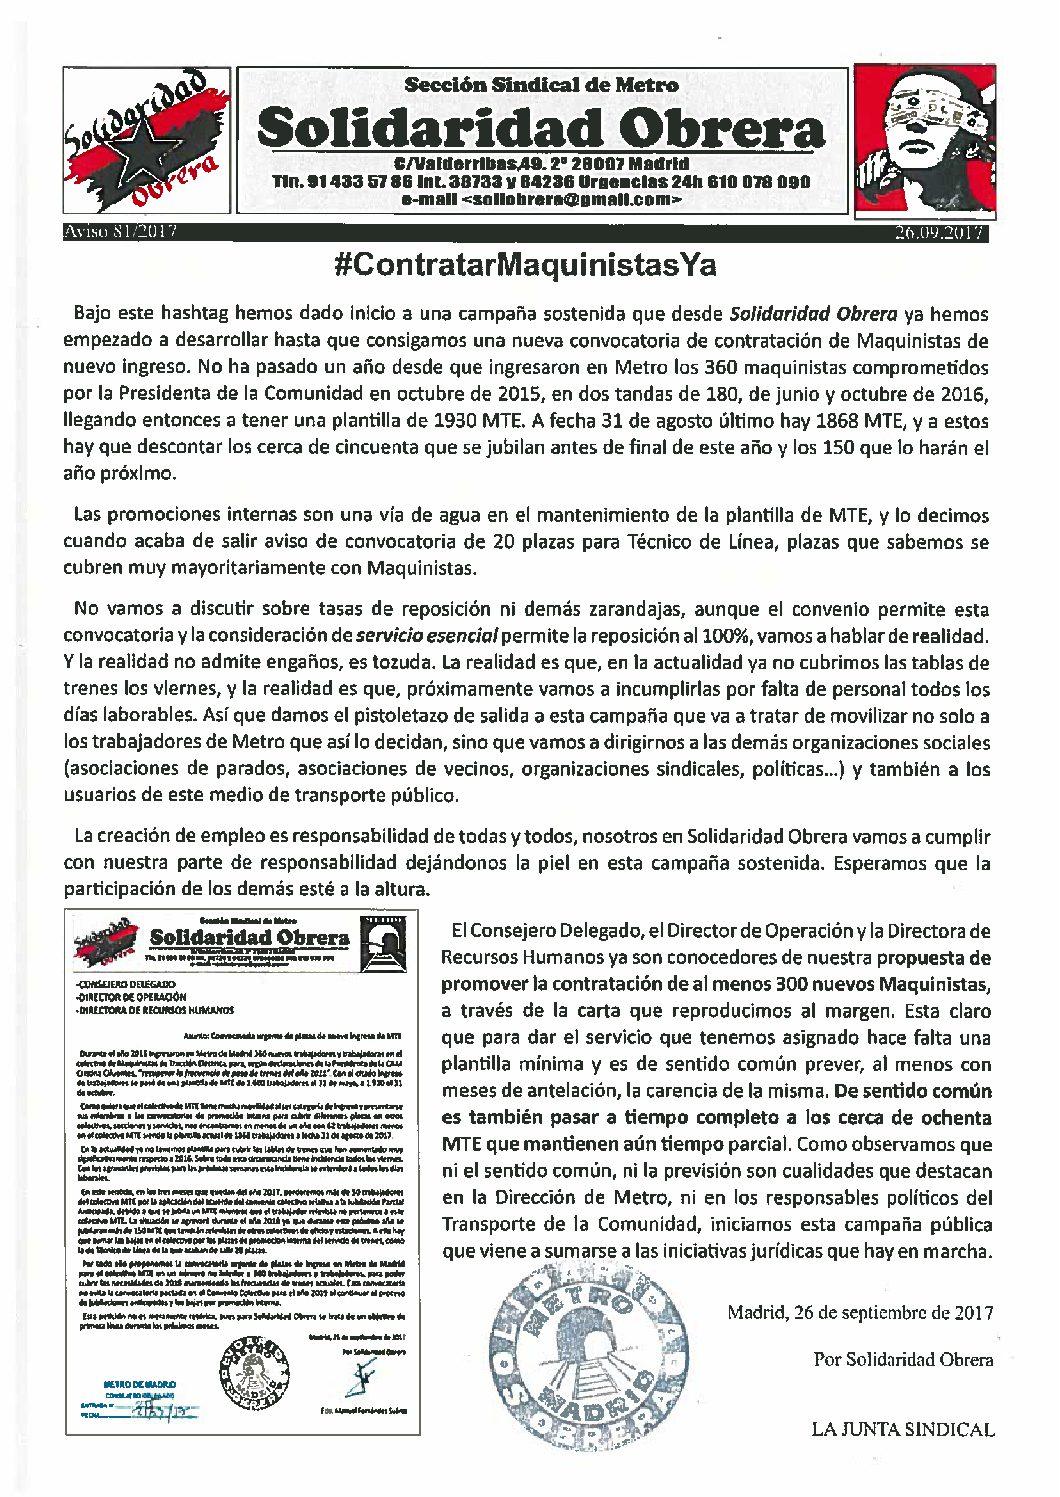 Aviso 81/2017 MetroMadrid – CREACIÓN DE EMPLEO MAQUINISTAS